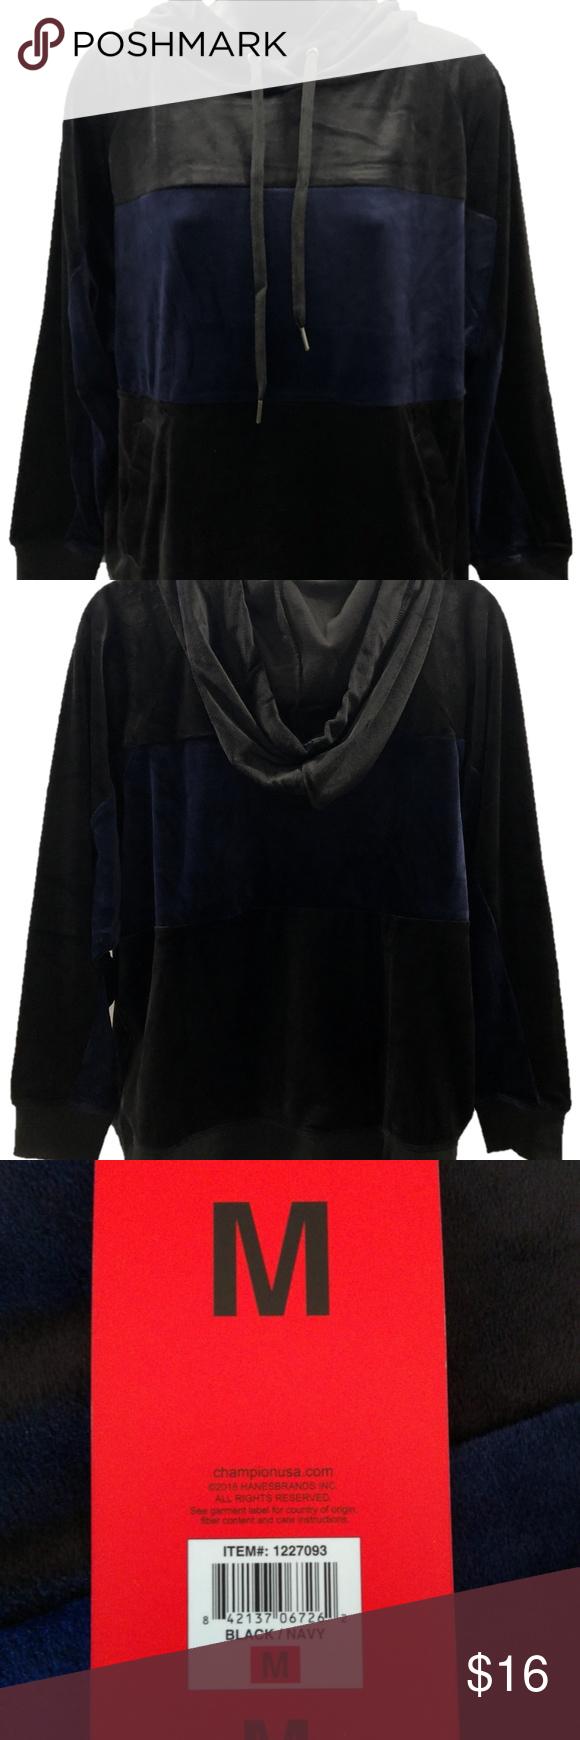 Champion Elite Women S Velour Hoodie Velour Hoodie Hoodies Sweatshirt Tops [ 1740 x 580 Pixel ]